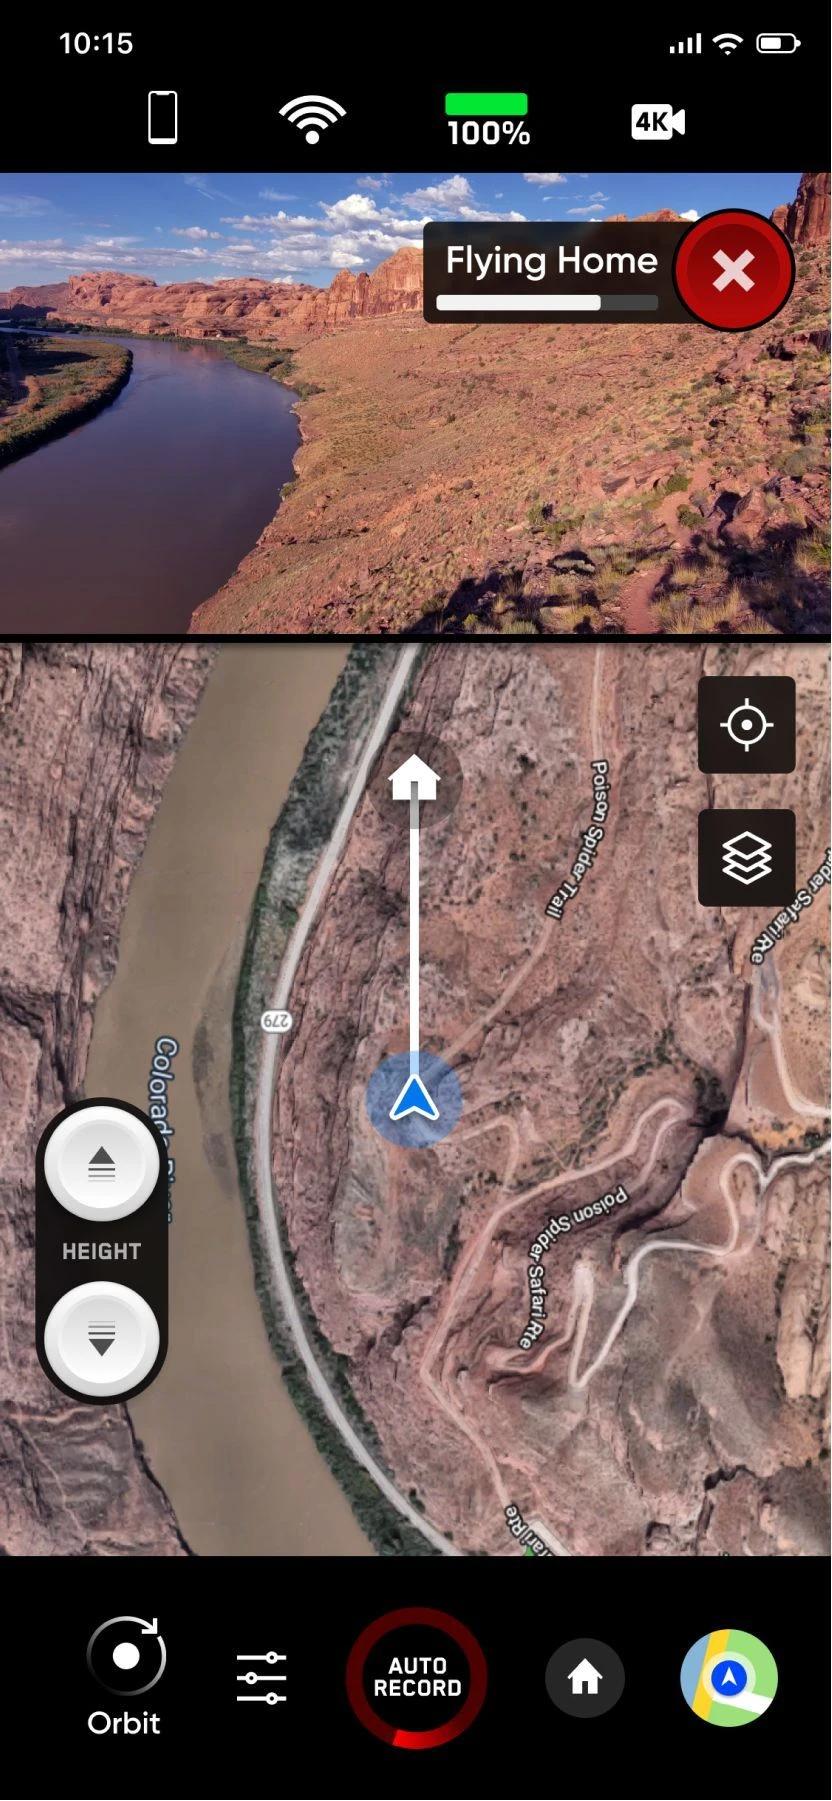 Skydio App 3